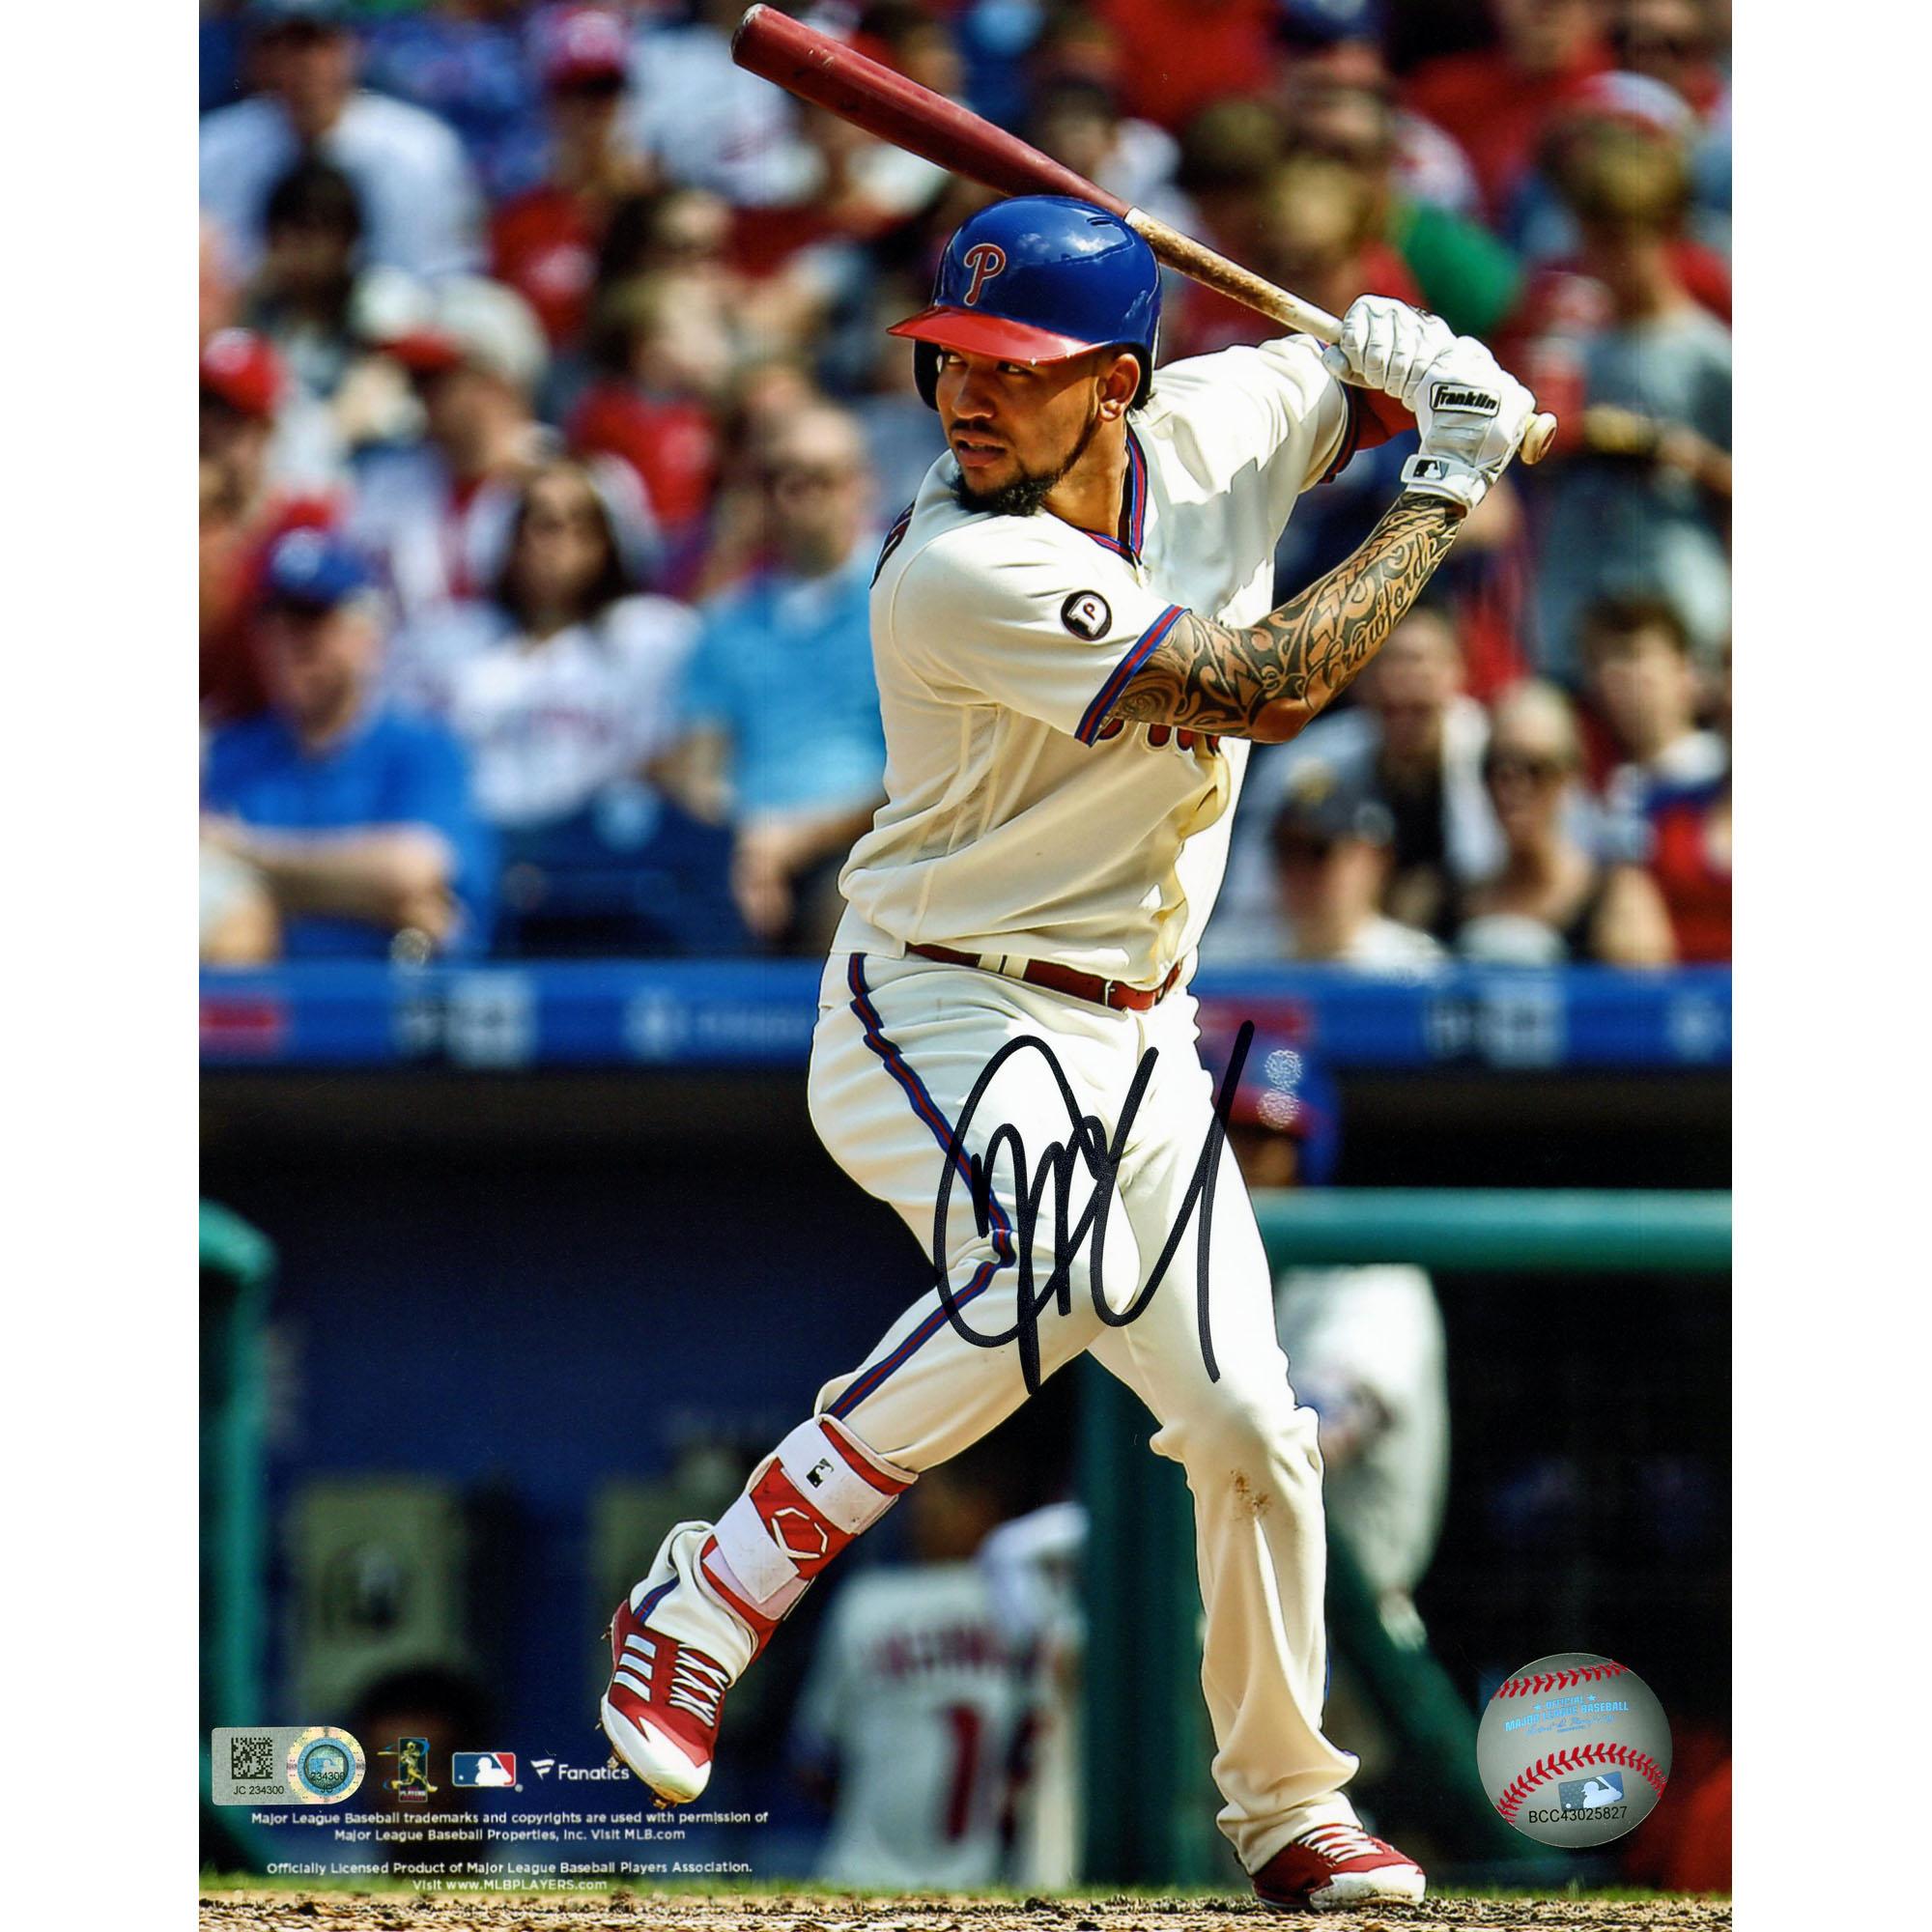 "JP Crawford Philadelphia Phillies Fanatics Authentic Autographed 8"" x 10"" Vertical Hitting Photograph - No Size"